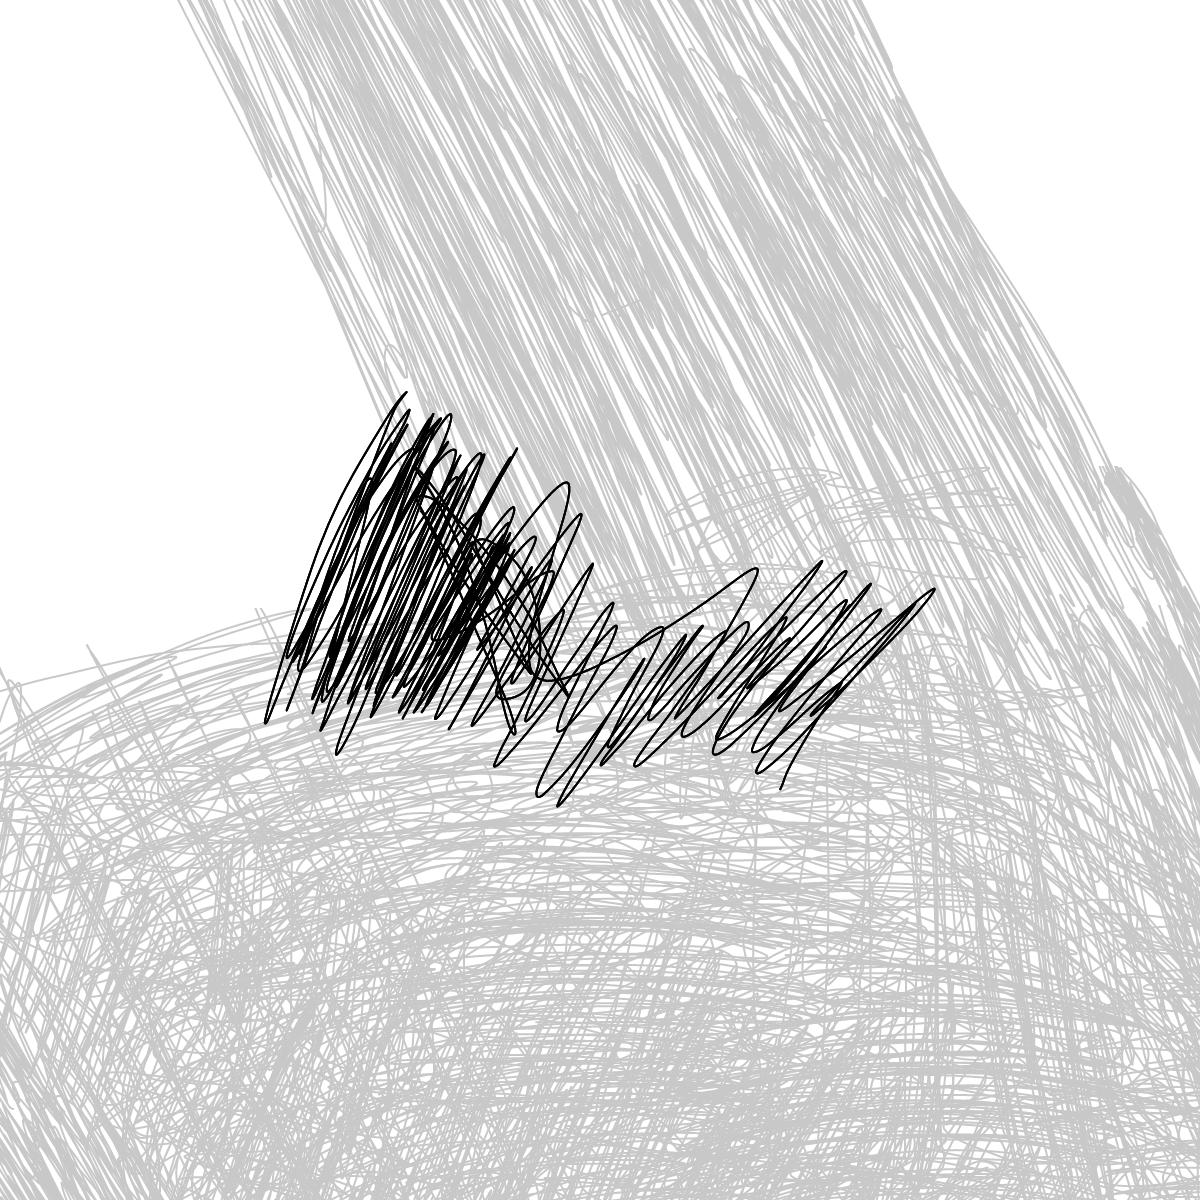 BAAAM drawing#6180 lat:52.4879837036132800lng: 13.4253377914428710